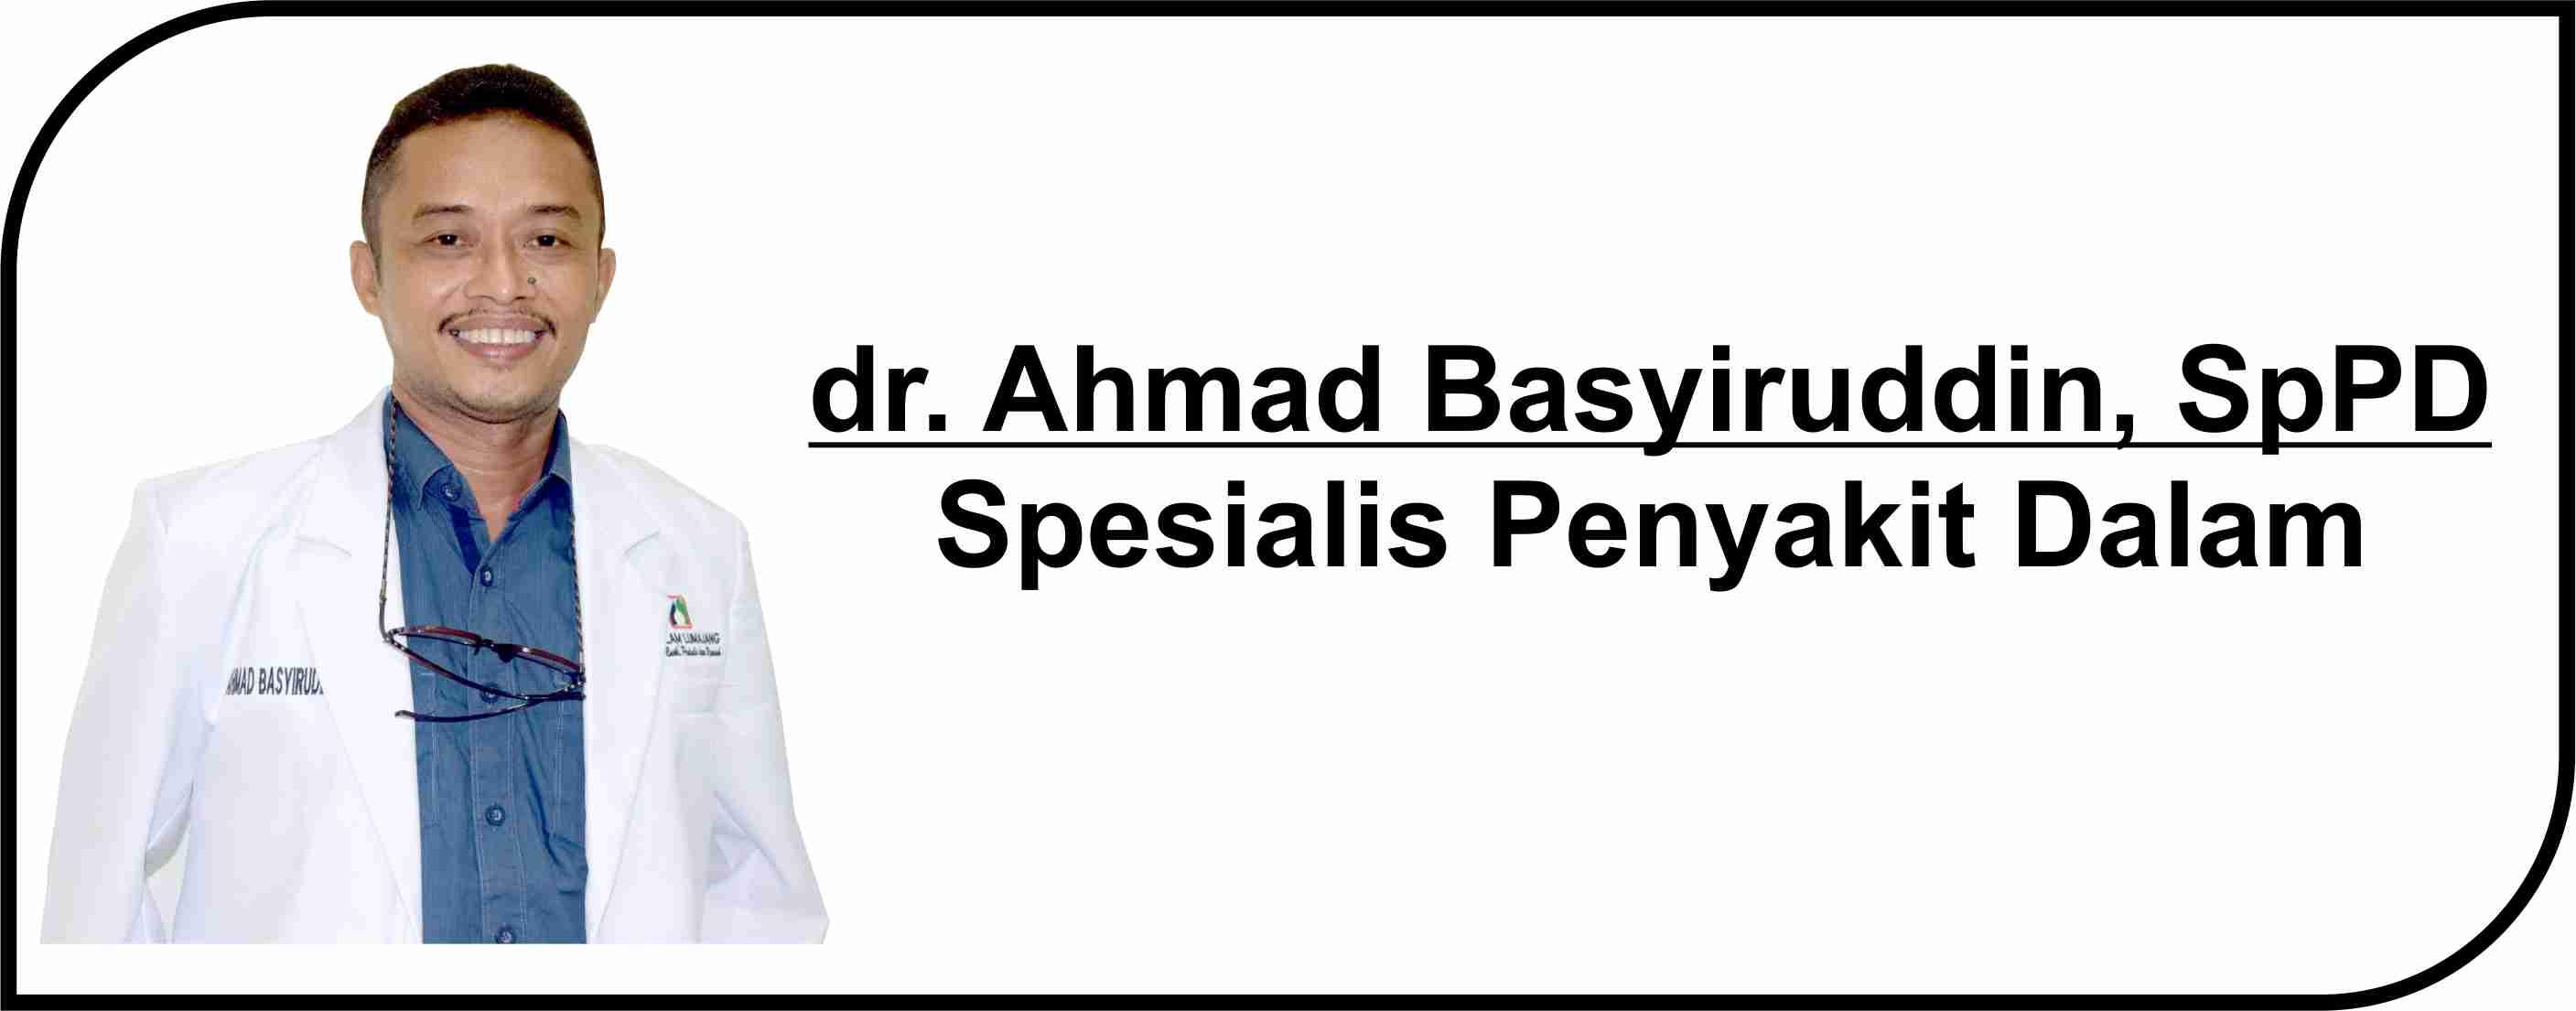 <p>Dokter Spesialis Penyakit Dalam</p>  <p>Melayani :</p>  <p>1. Pasien Rawat Inap</p>  <p>2. Pasien Rawat Jalan</p>  <p><strong>Jadwal Praktik Poli :</strong></p>  <p>Selasa - Jum'at : 15.00- 16.30 WIB</p>